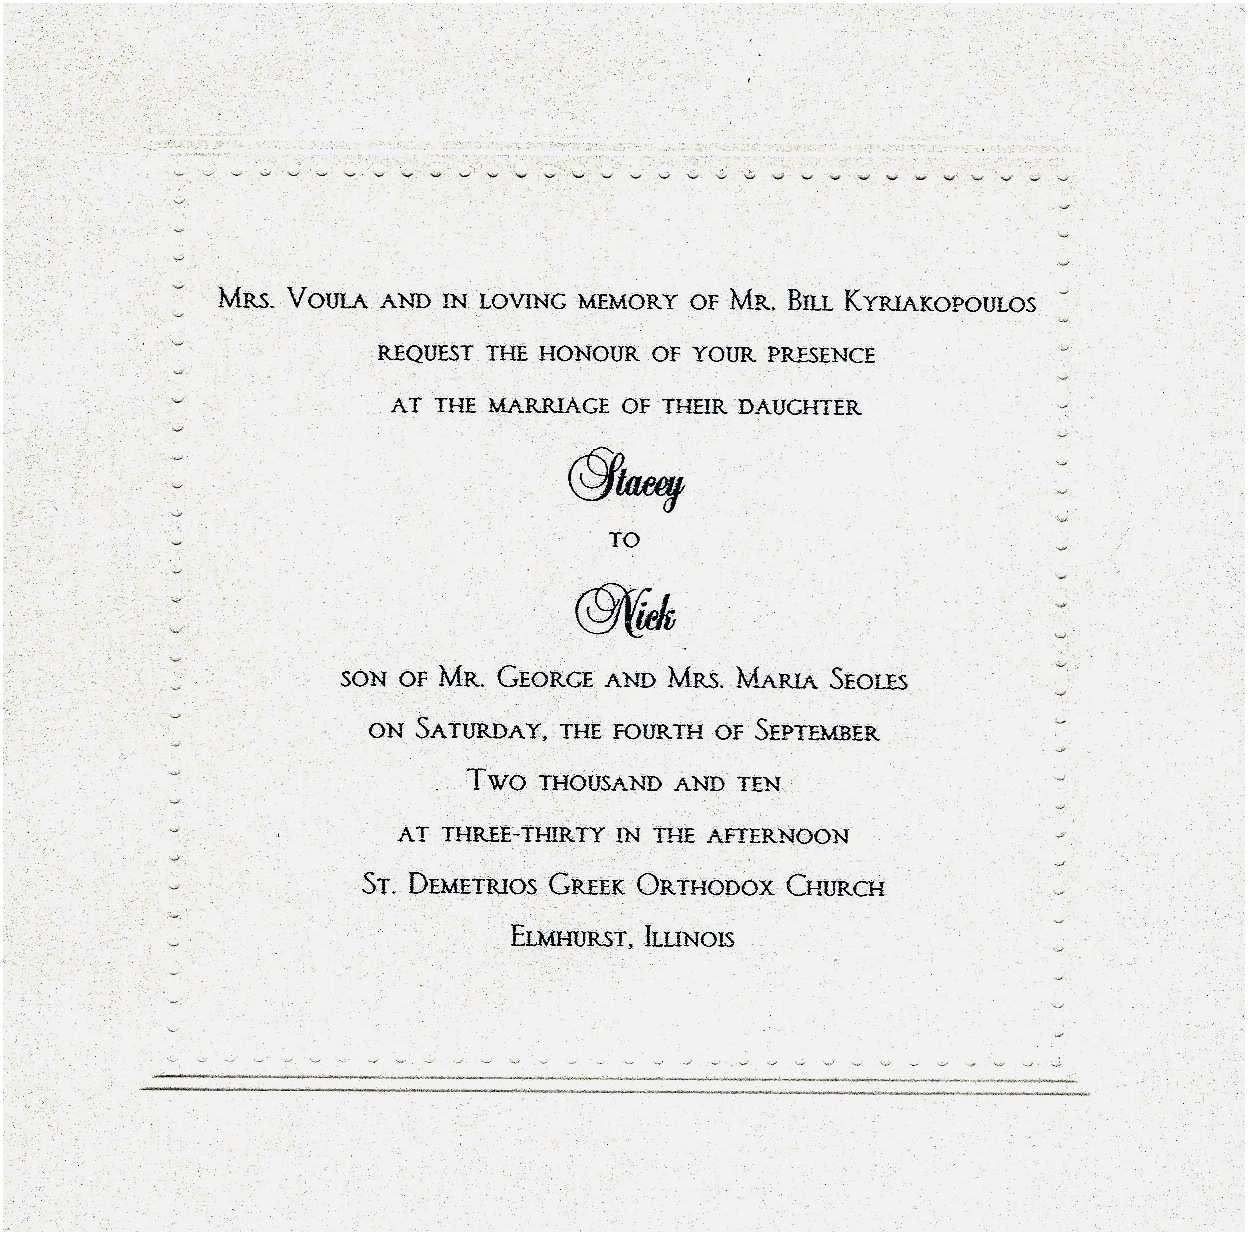 Wedding Invitation Wording for Friends Funny Wedding Quotes for Cards for Friends Image Quotes at